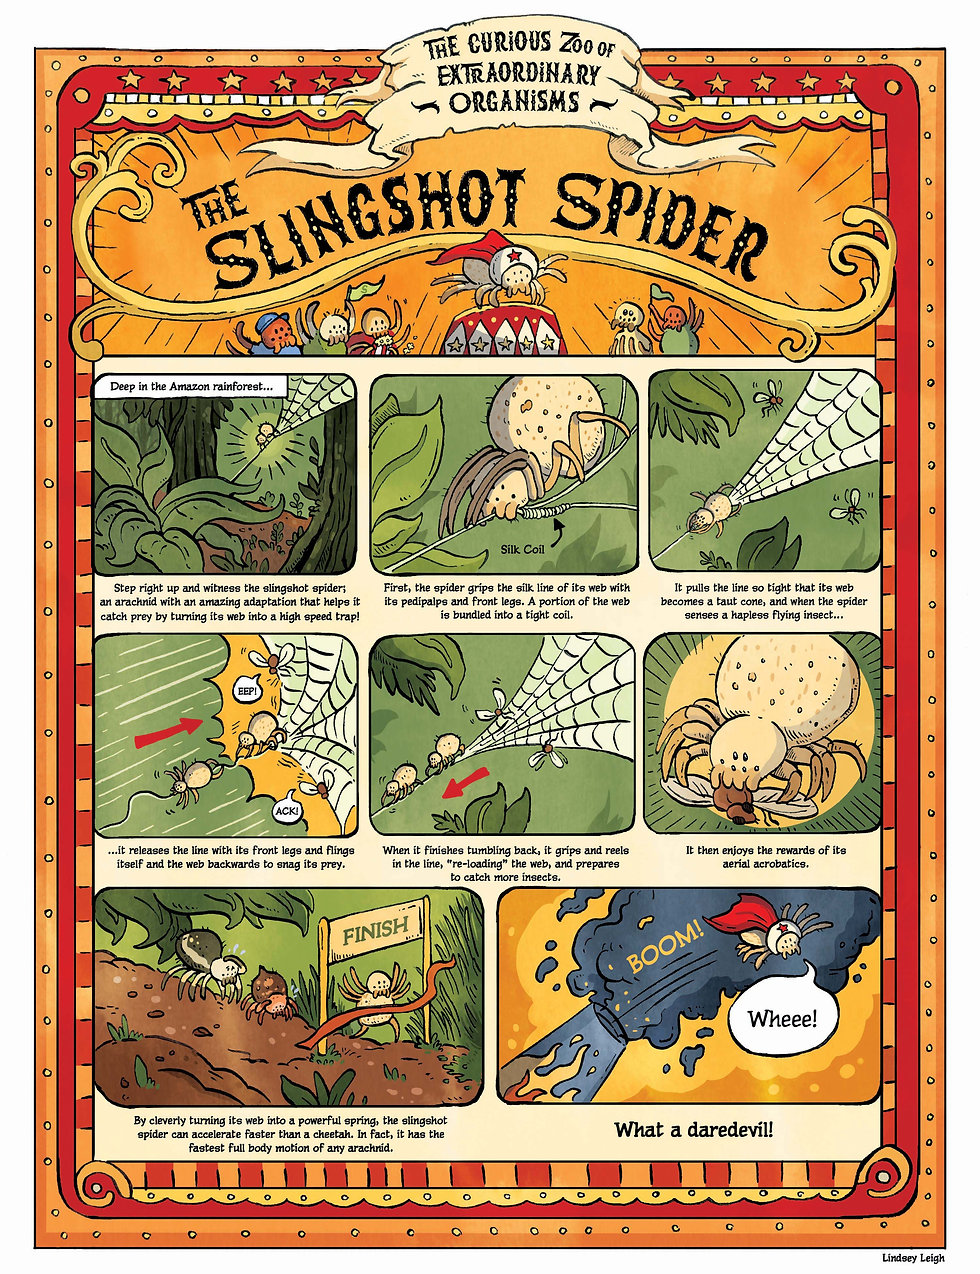 The Curious Zoo of Extraordinary Organisms. Comic on Slingshot Spider. Bhamla Georgia Tech 2020